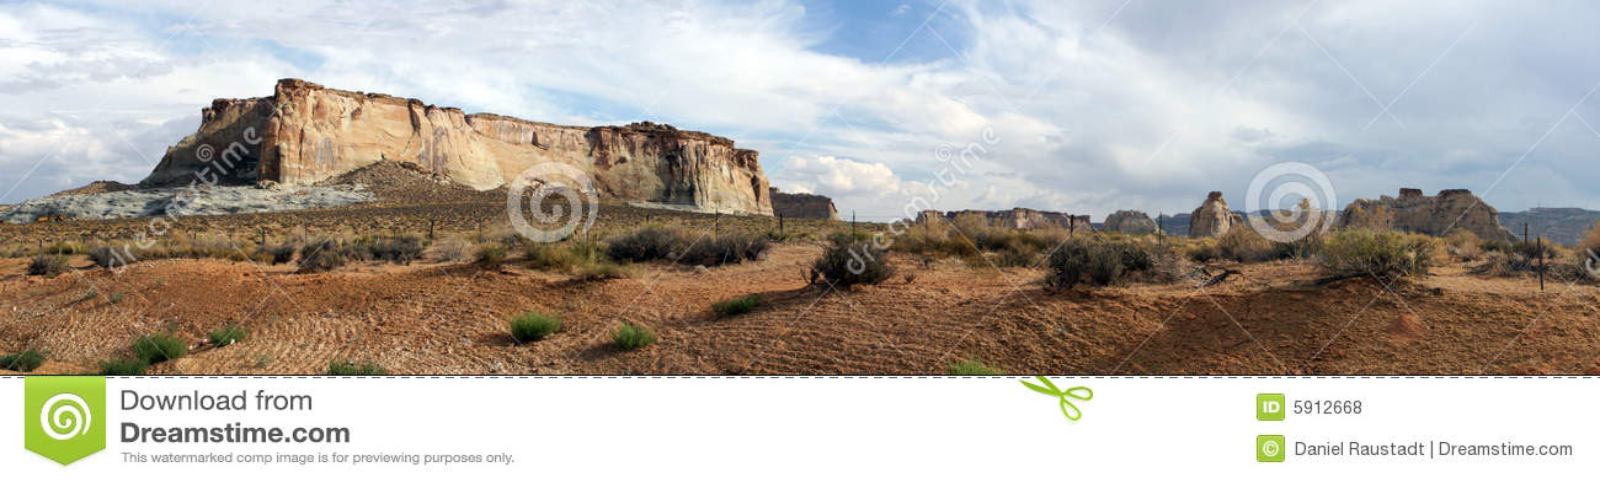 Rocky Arizona mountain plateau panorama